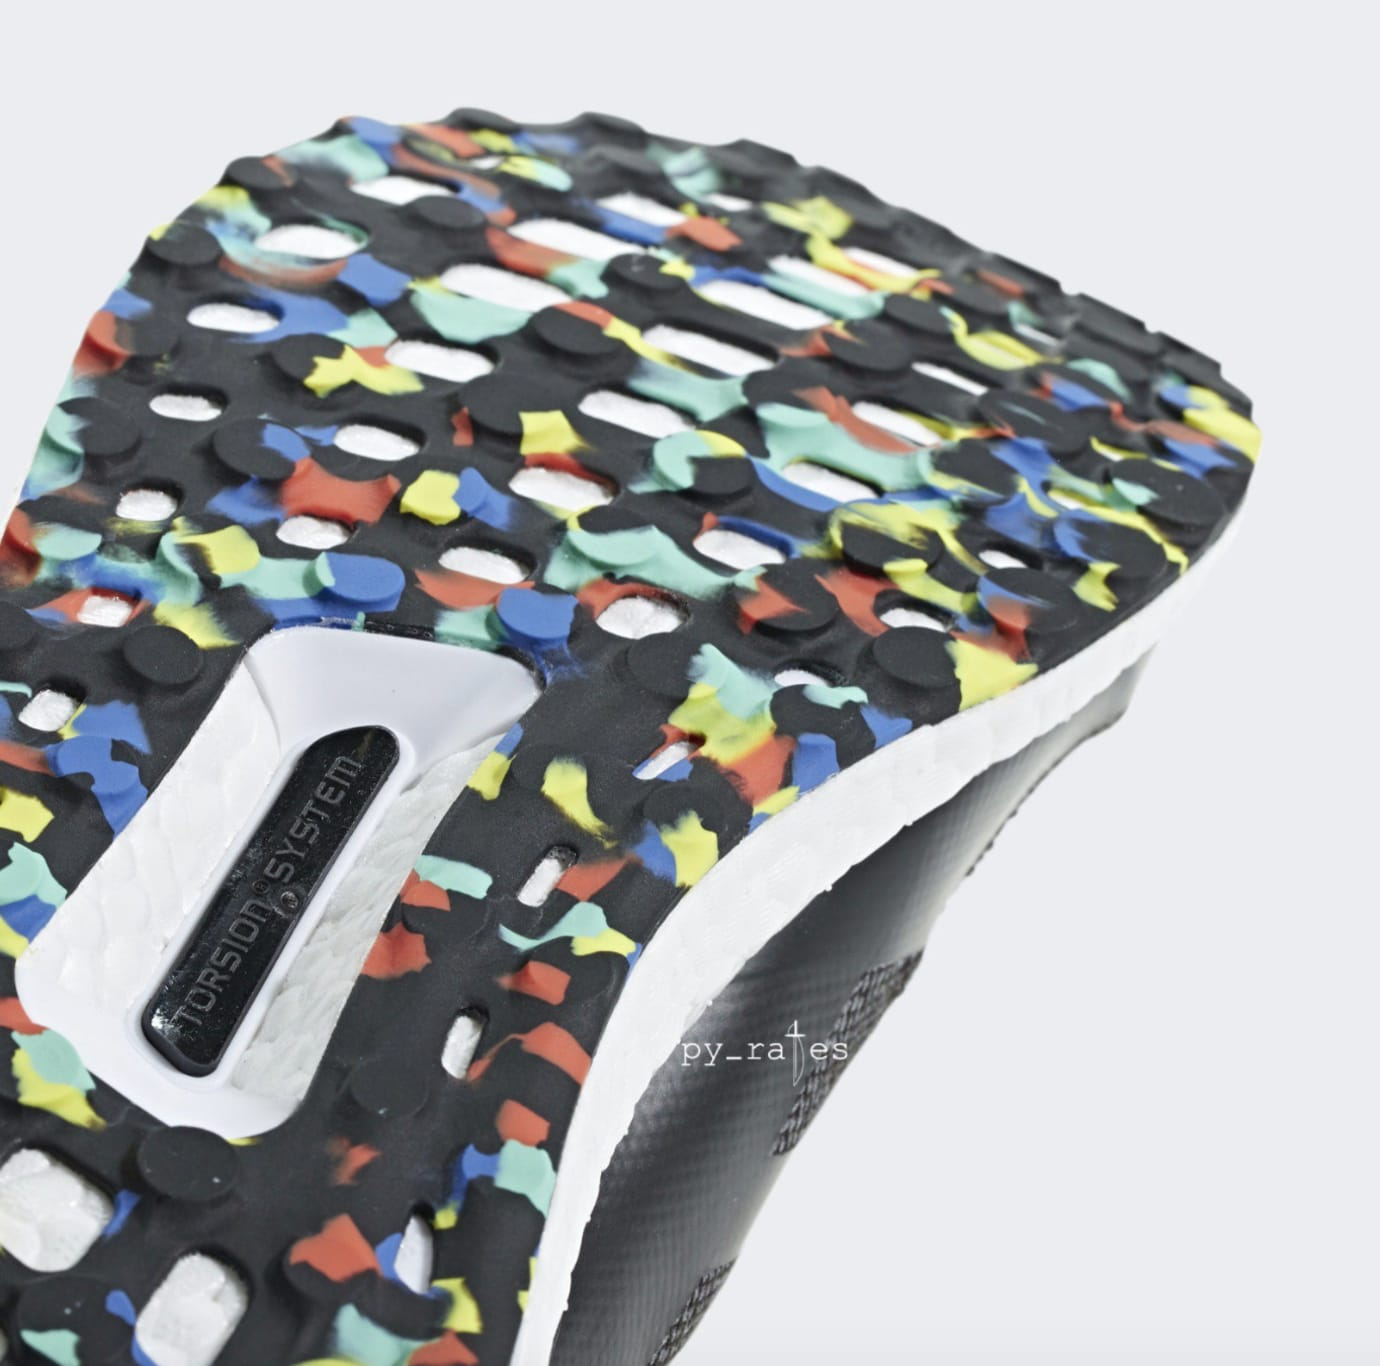 Adidas Ultra Boost Mid 'Black/Multicolor' (Bottom)